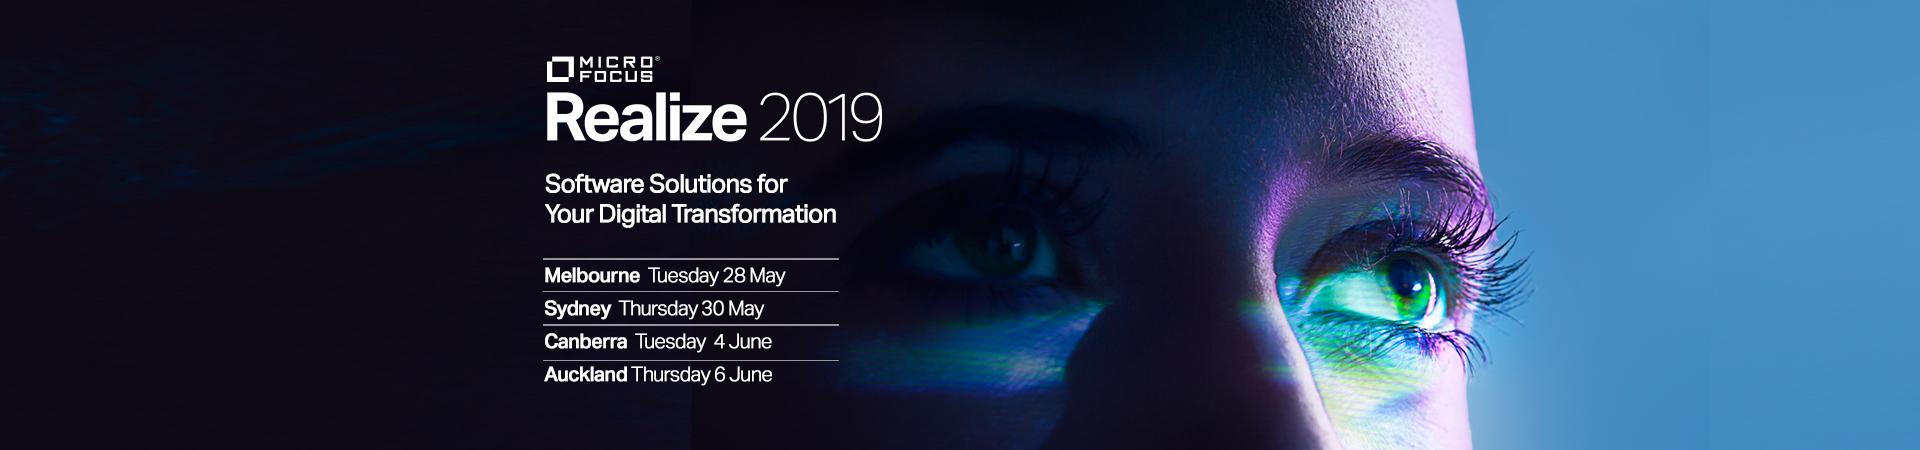 Micro Focus REALIZE 2019